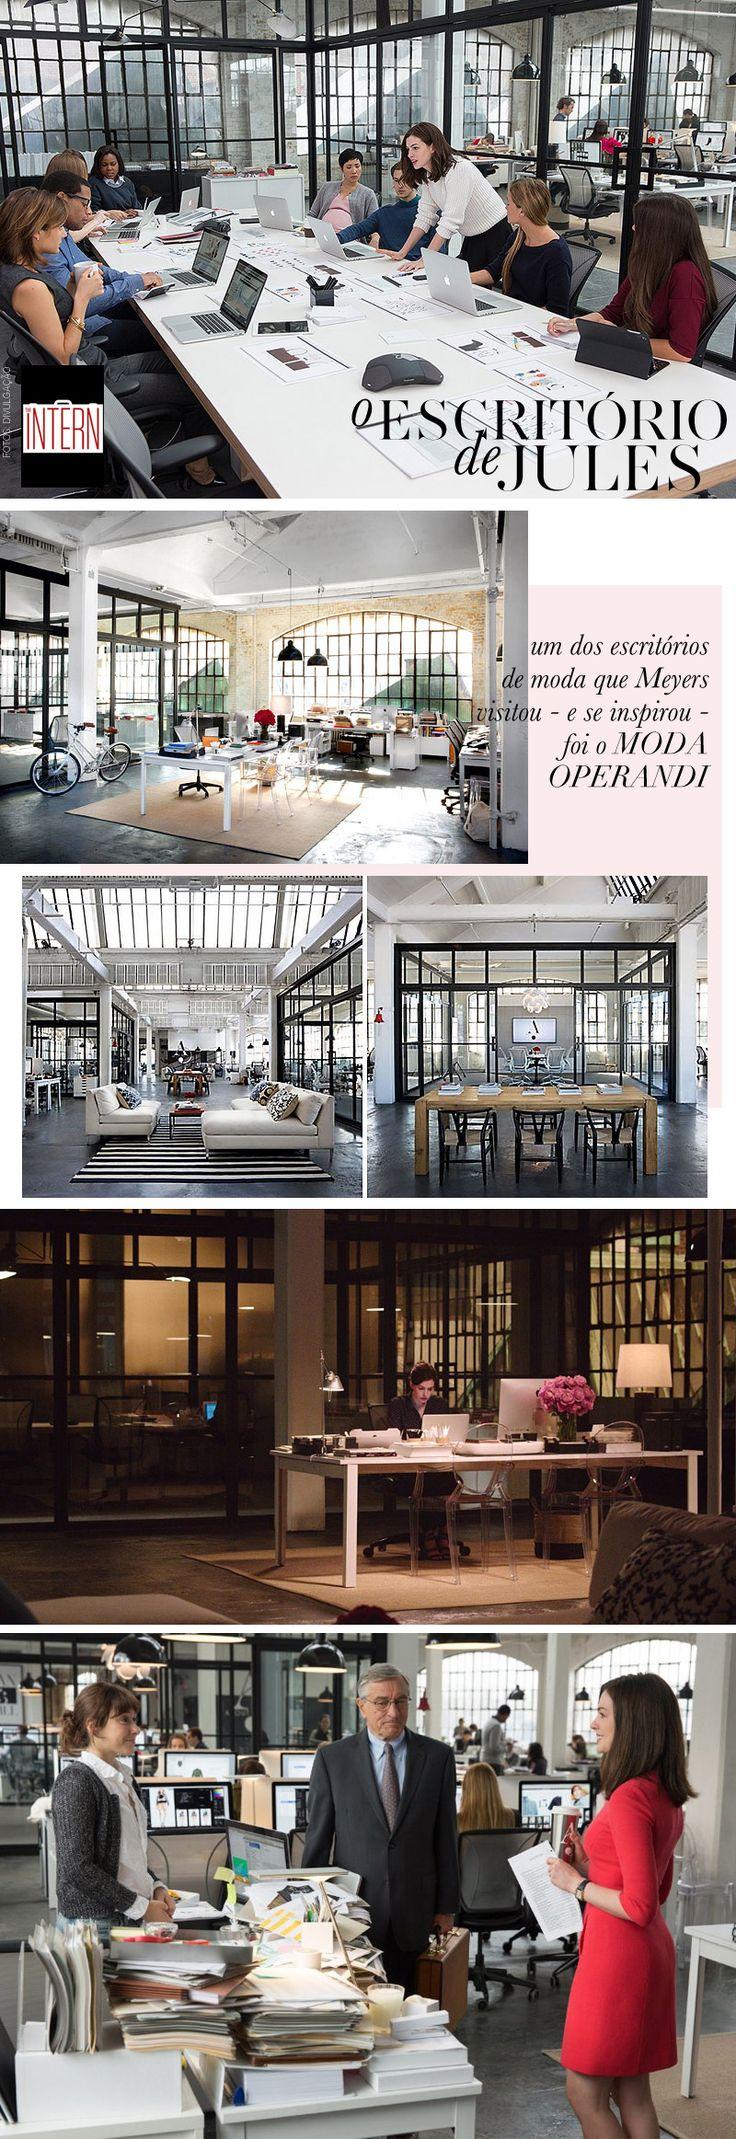 living-gazette-barbara-resende-mix-filme-lancamento-the-intern-set-jules-office